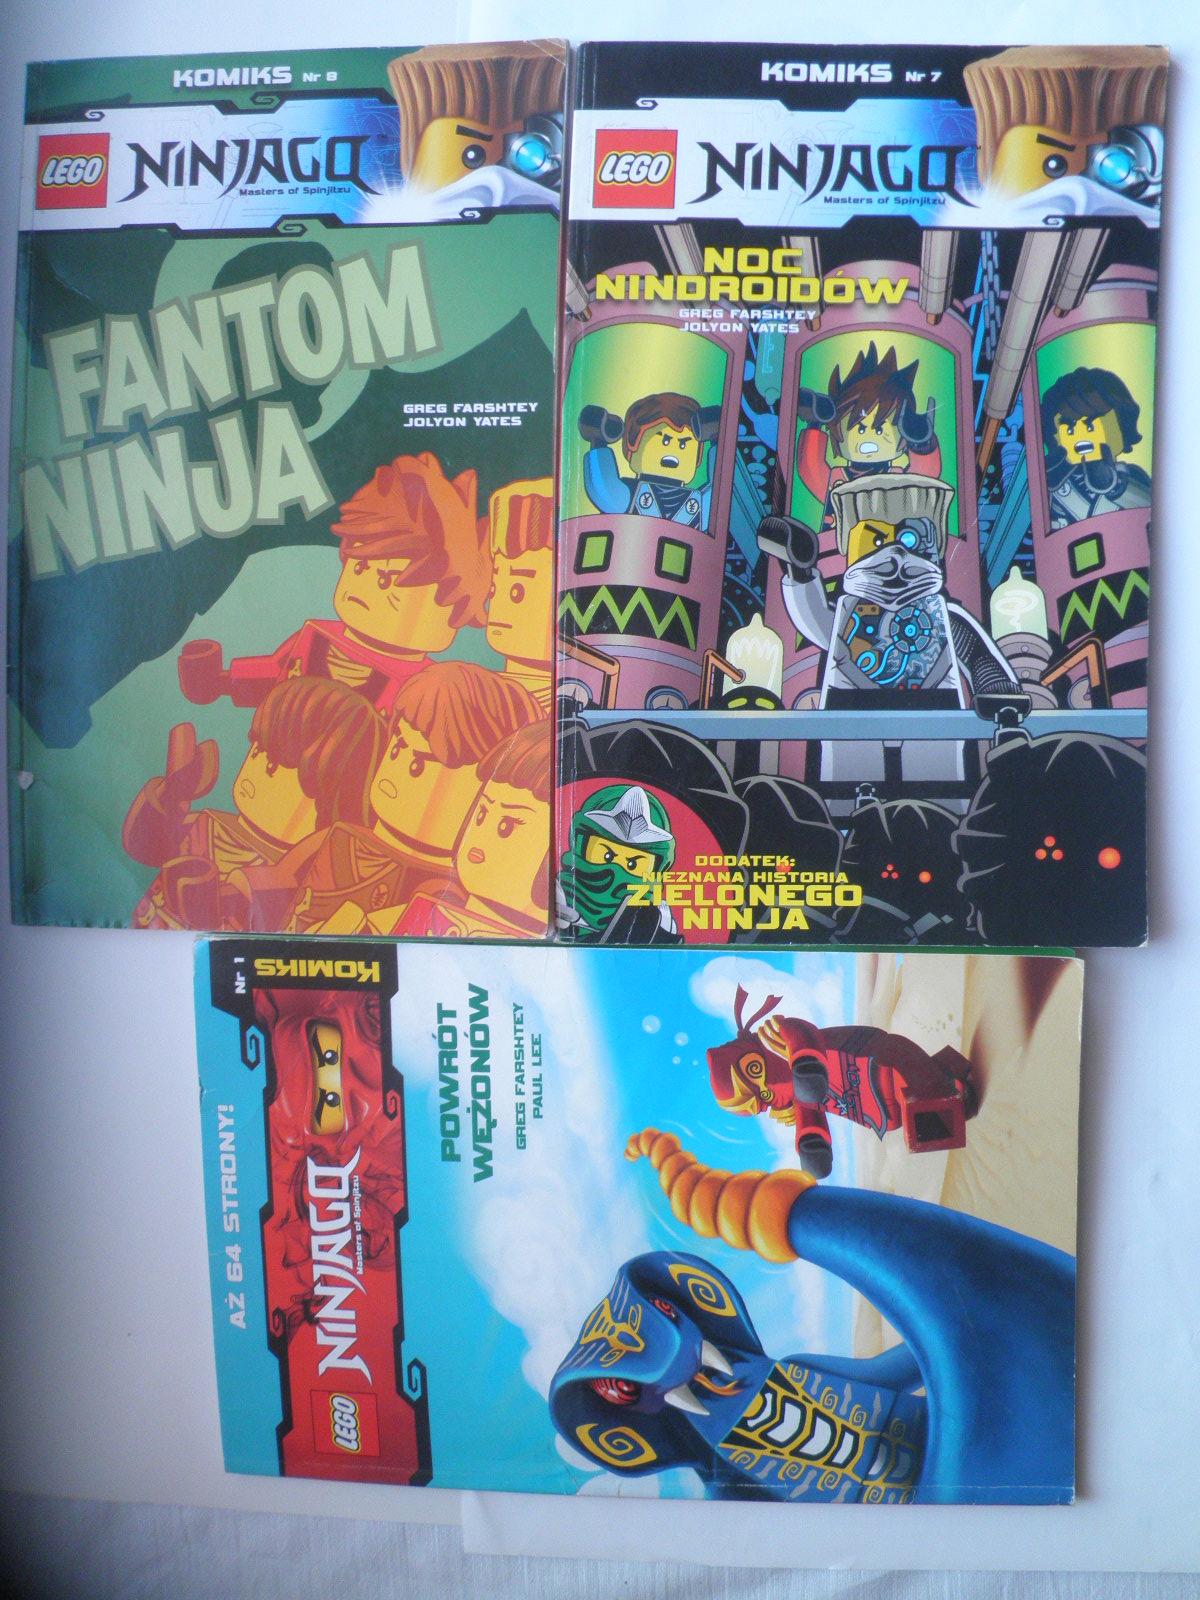 NINJAGO LEGO FANTOM POWRÓT WIĘŹNIÓW KOMIKS 4 sztuk